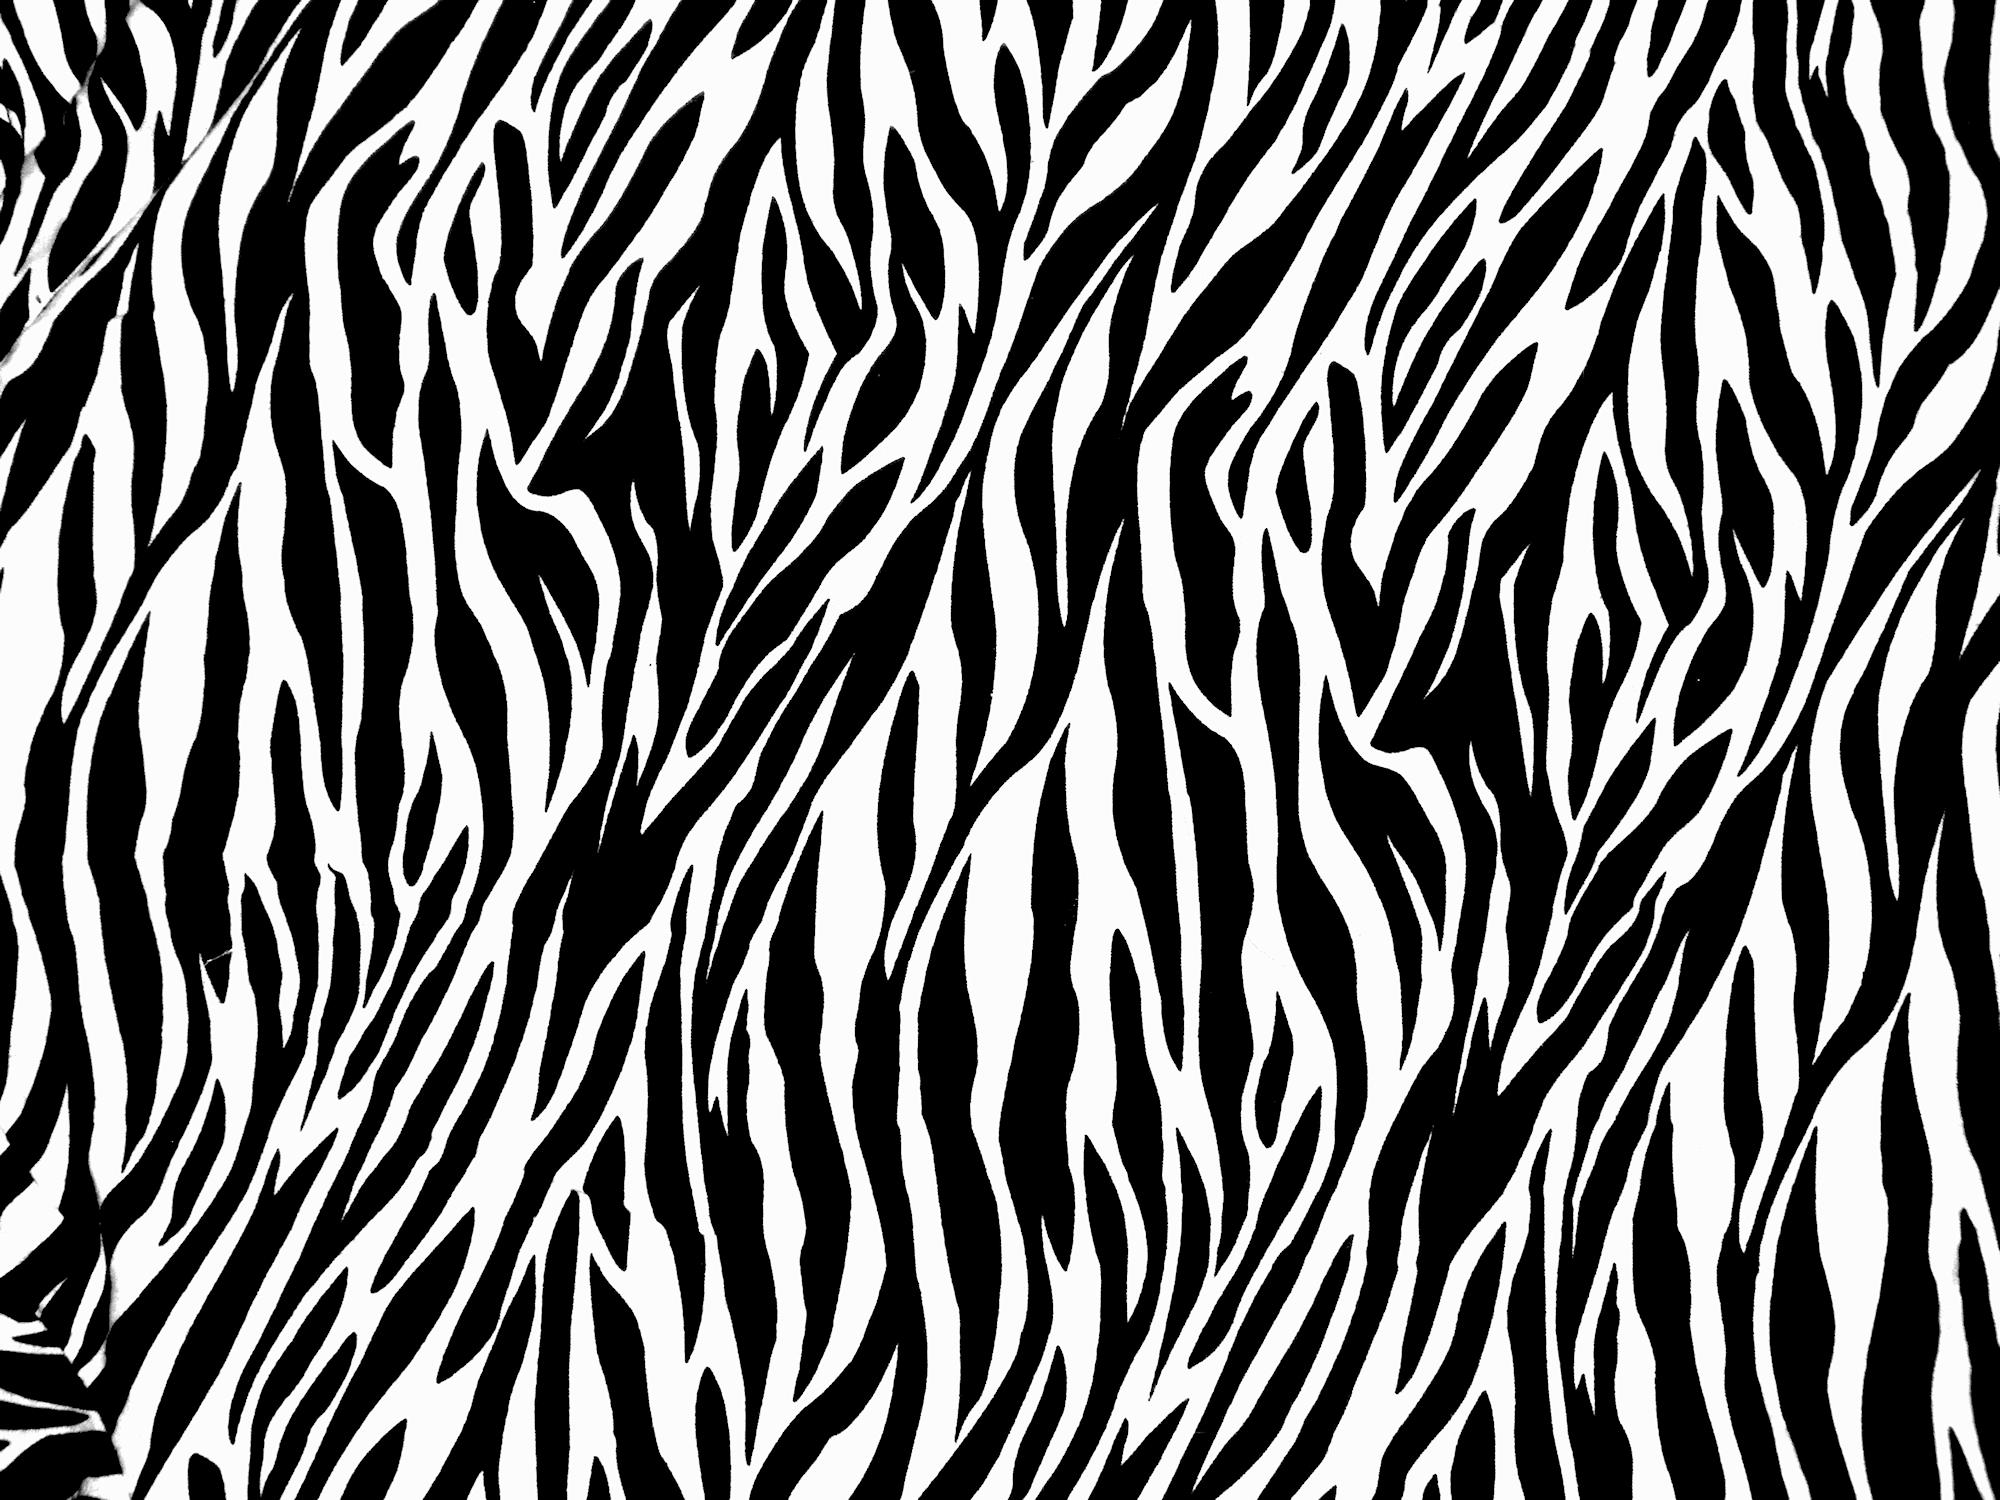 10 Zebra Print Graphics Images